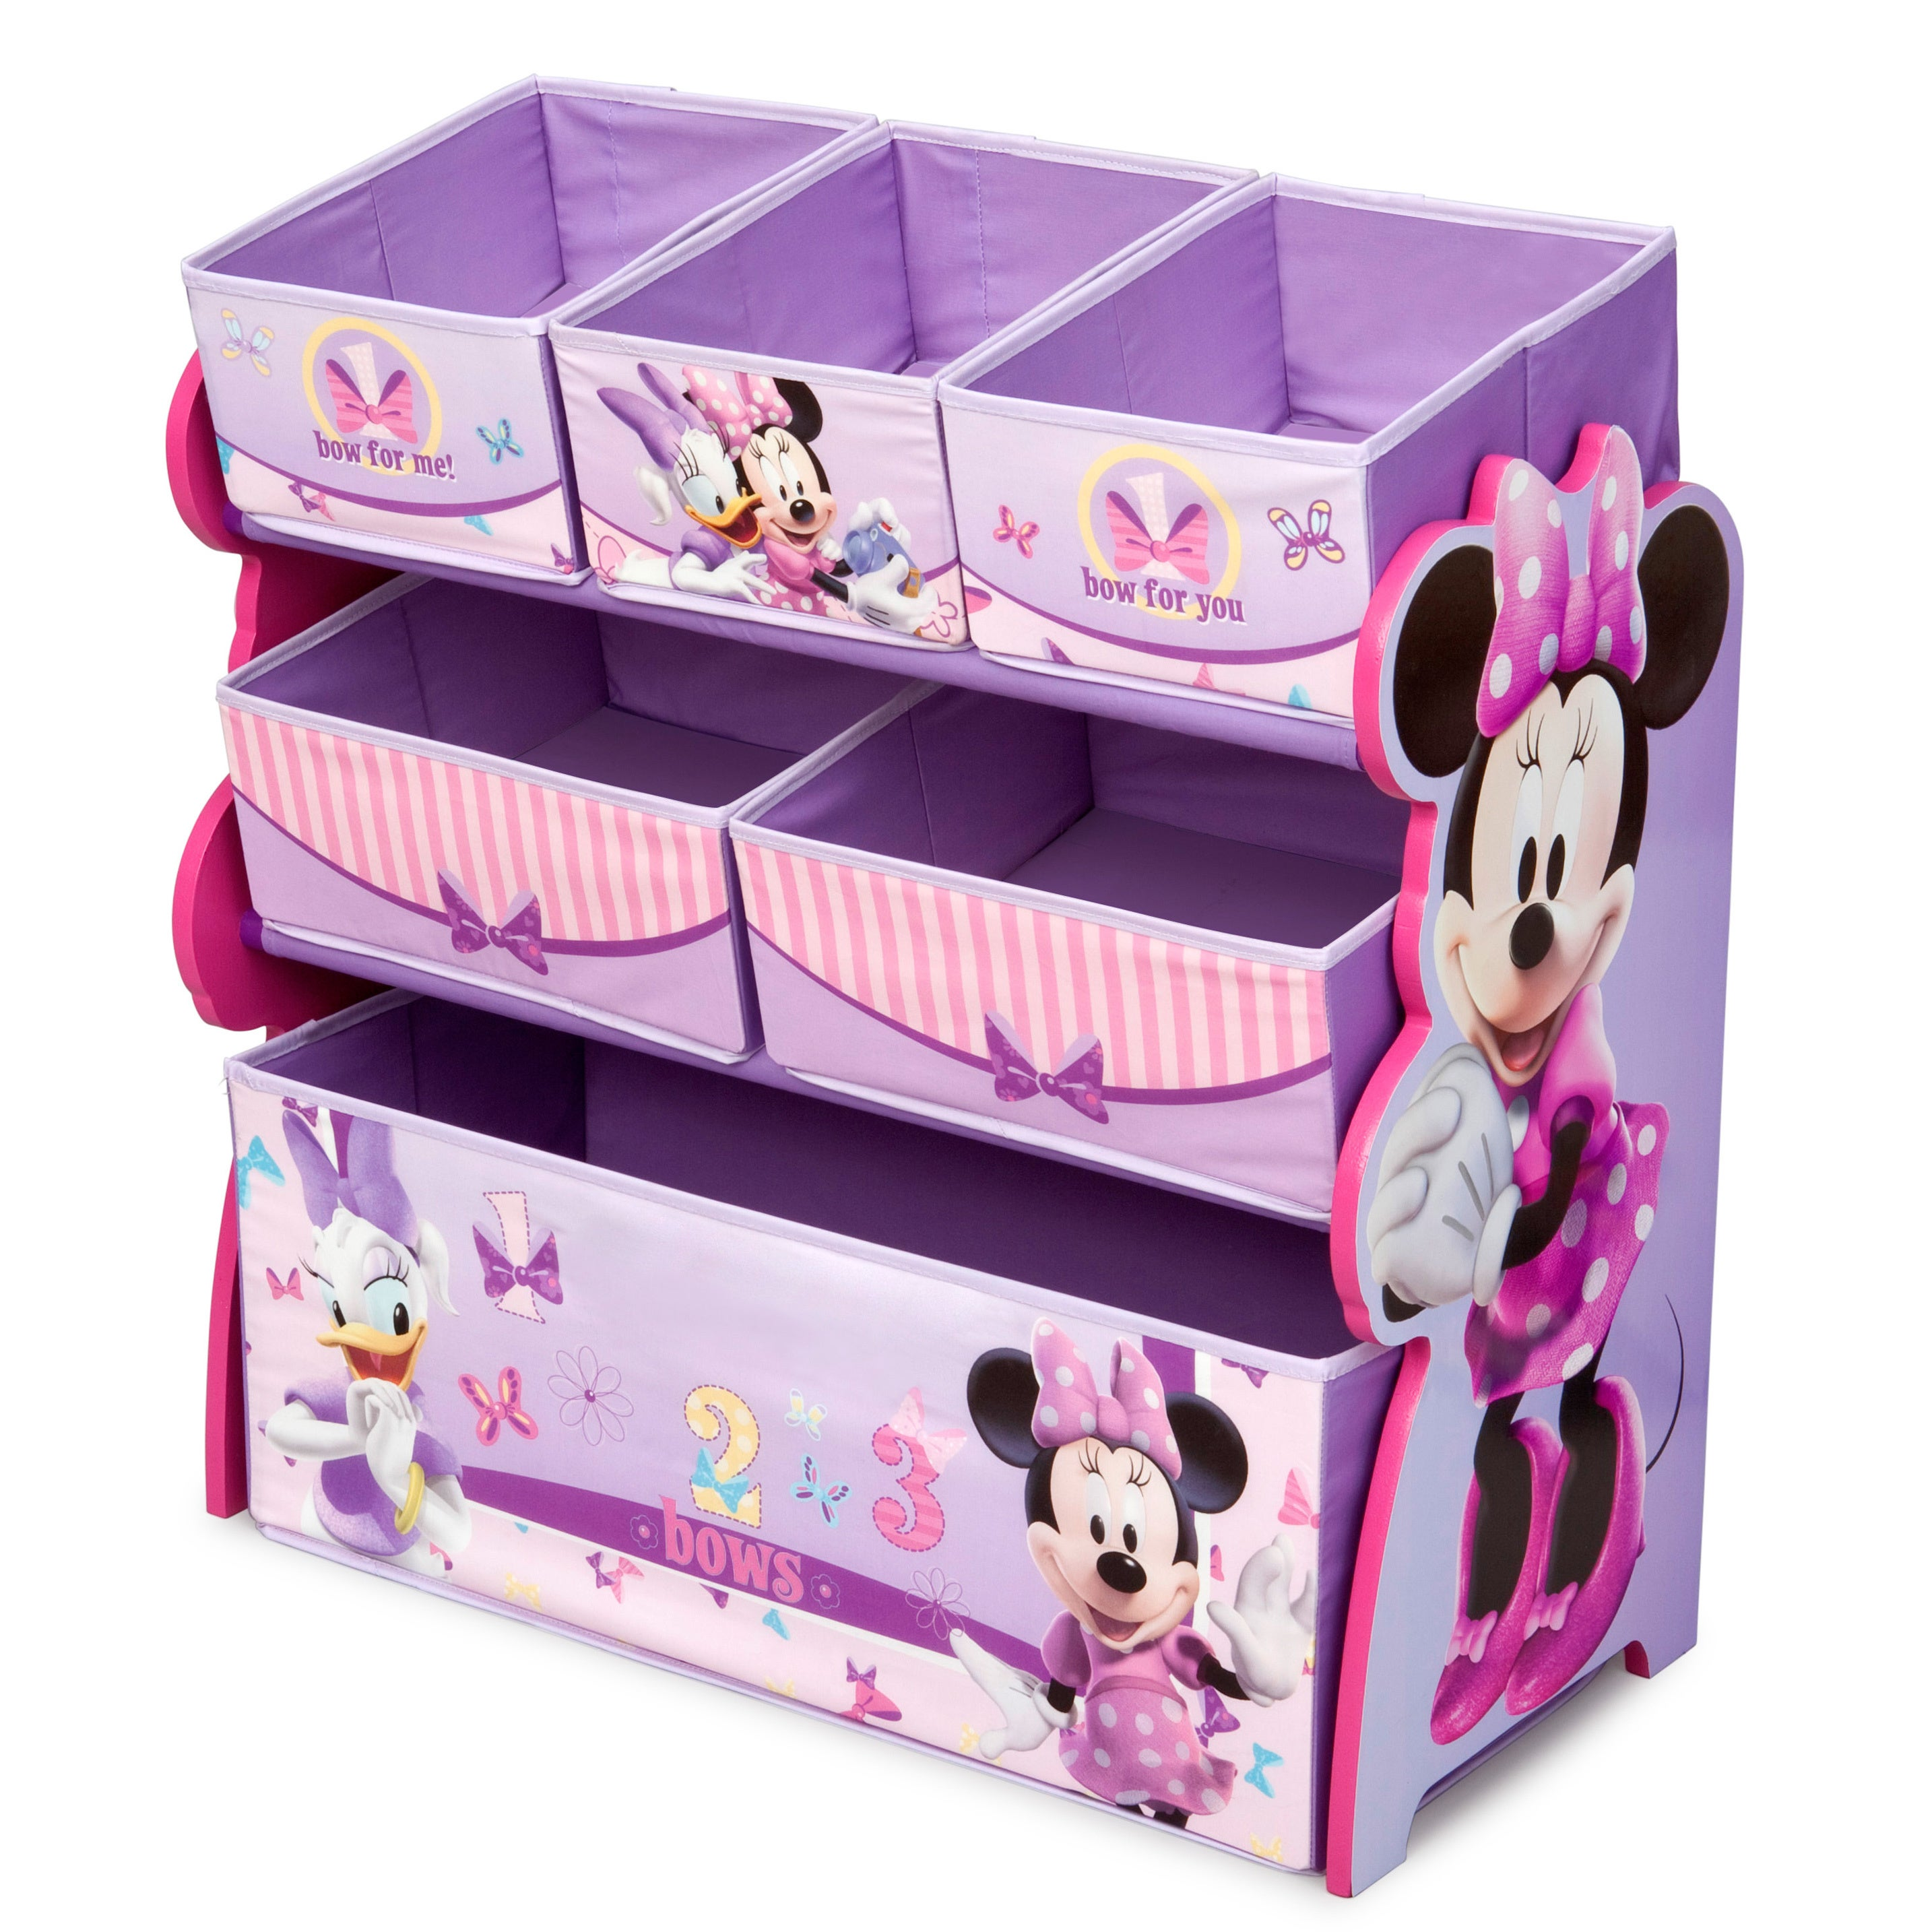 Delta Multi Bin Organizer (Minnie Mouse), Pink